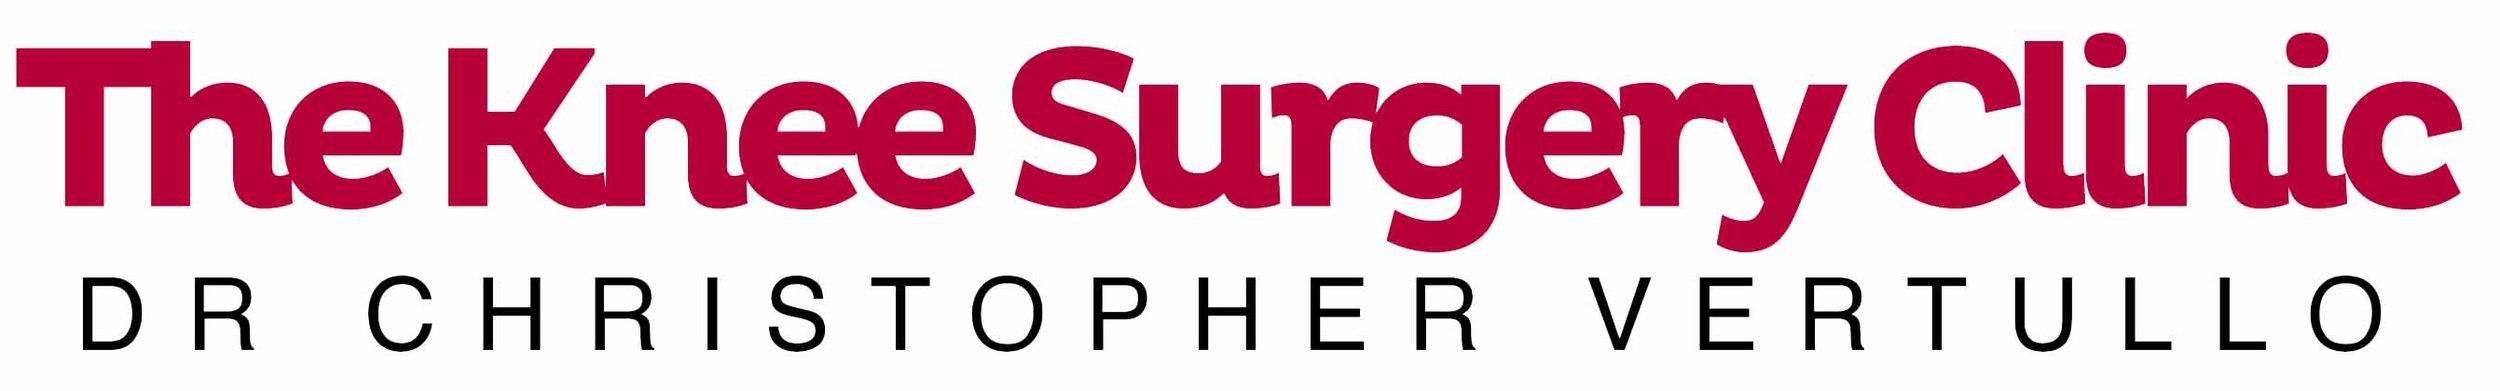 Dr Christopher Vertullo Knee Surgeon Gold Coast